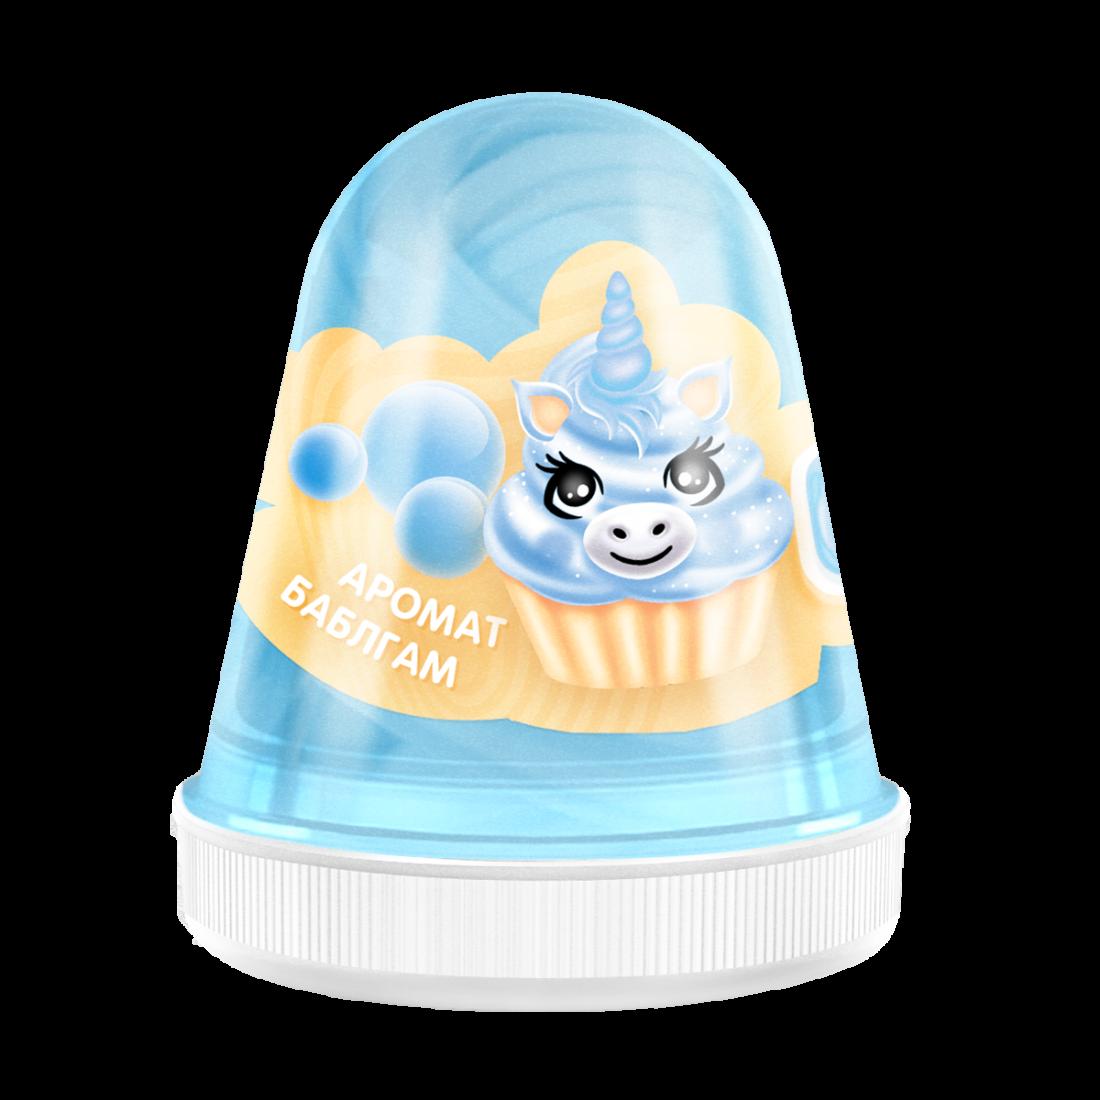 Слайм MONSTER'S SLIME FL005 Fluffy Бабл-гам голубой